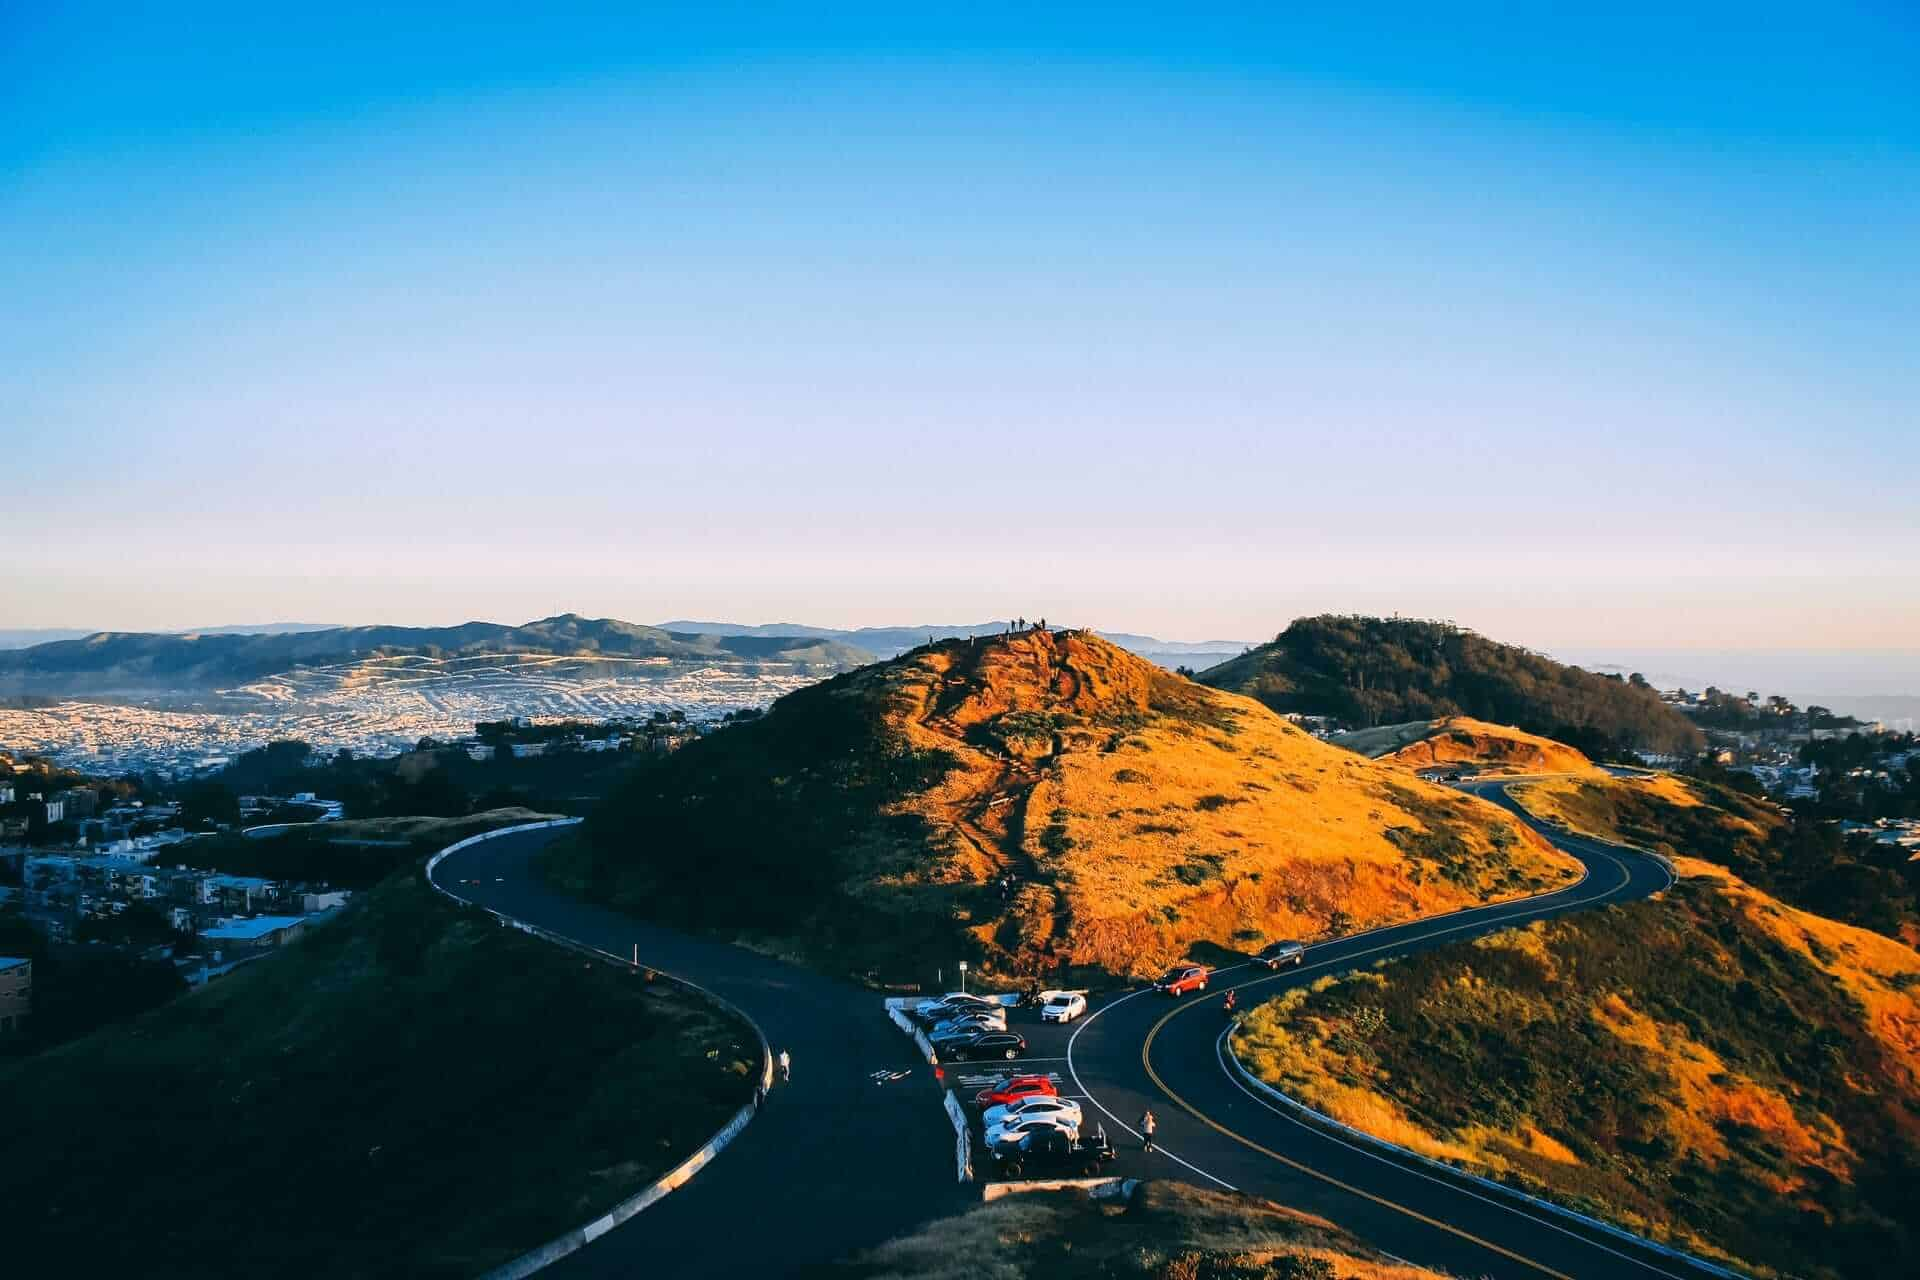 Twin Peaks, San Francisco, USA